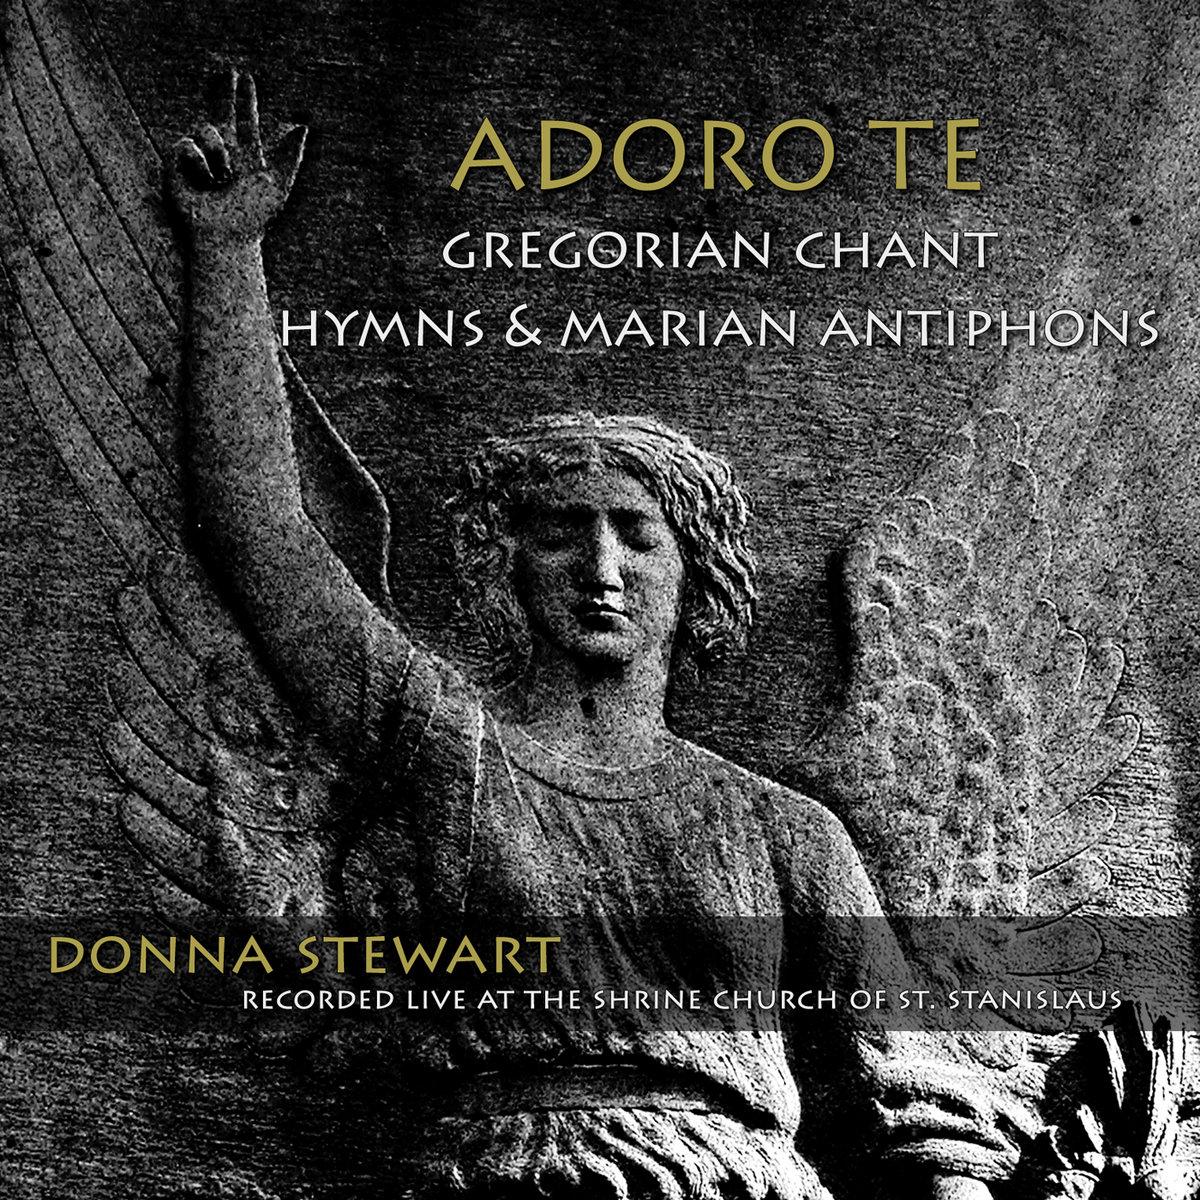 adoro te gregorian chant hymns marian antiphons mignarda. Black Bedroom Furniture Sets. Home Design Ideas